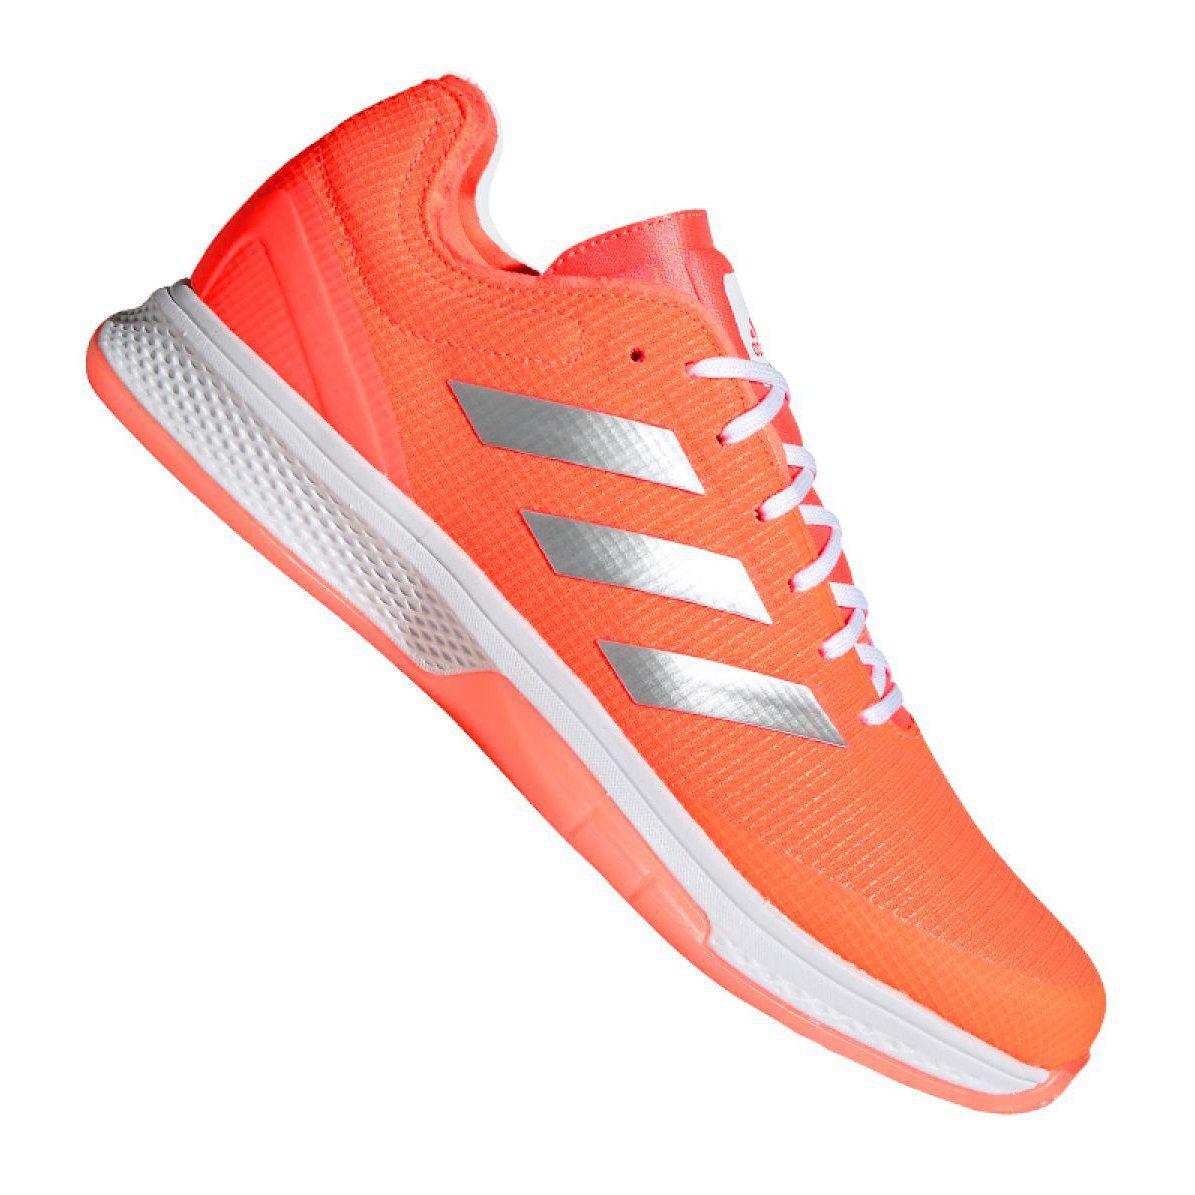 Buty Adidas Counterblast Bounce M Eh0851 Pomaranczowe Wielokolorowe Adidas Samba Sneakers Adidas Sneakers Adidas